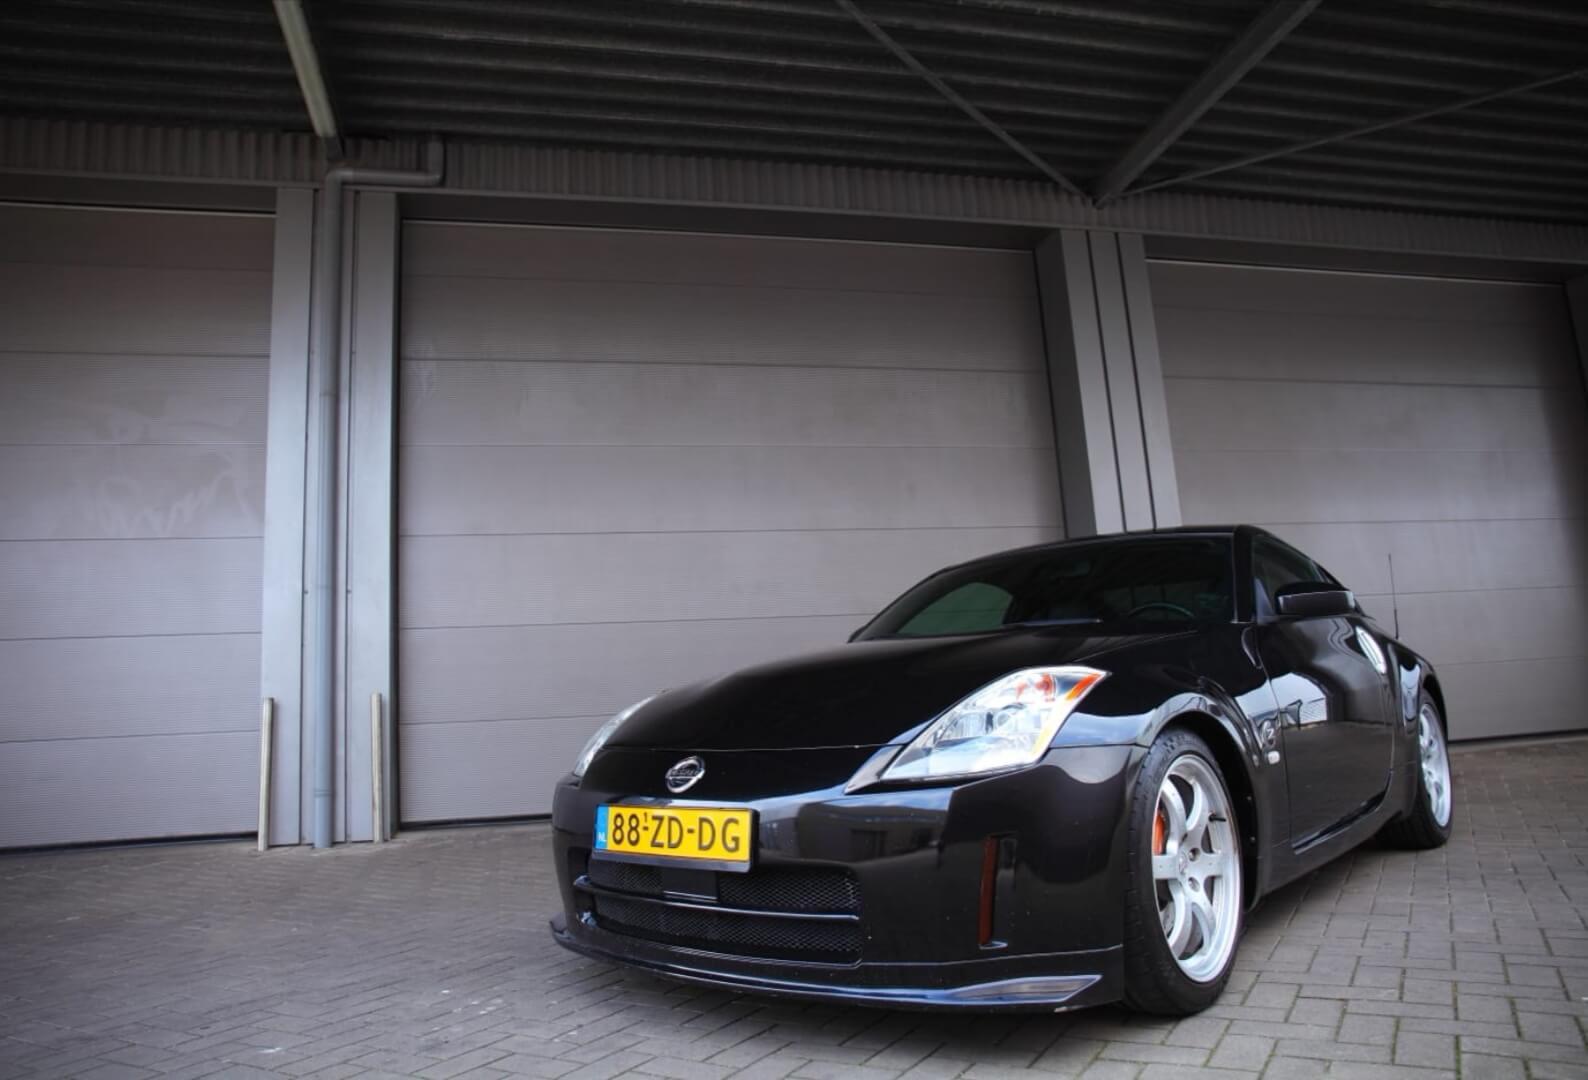 Nissan 350Z HR Track Edition 2008 – by Next Level Automotive – Go to nextlevelautomotive.eu